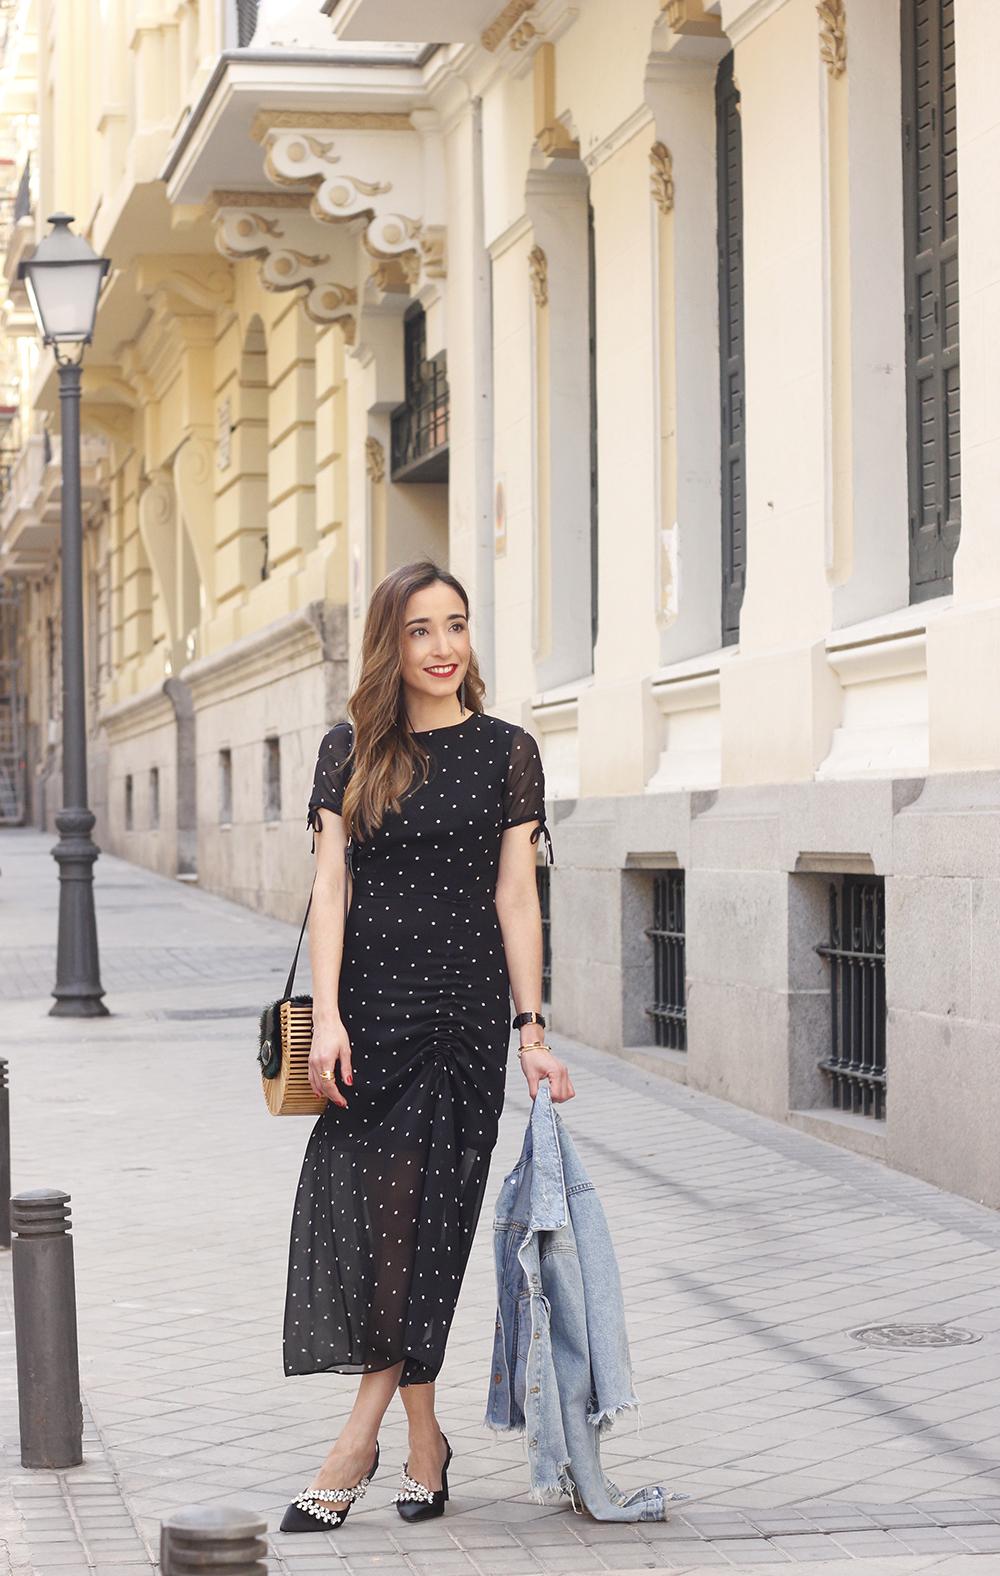 polka dot dress uterqüe jewel heels denim jacket outfit street style bamboo bag01